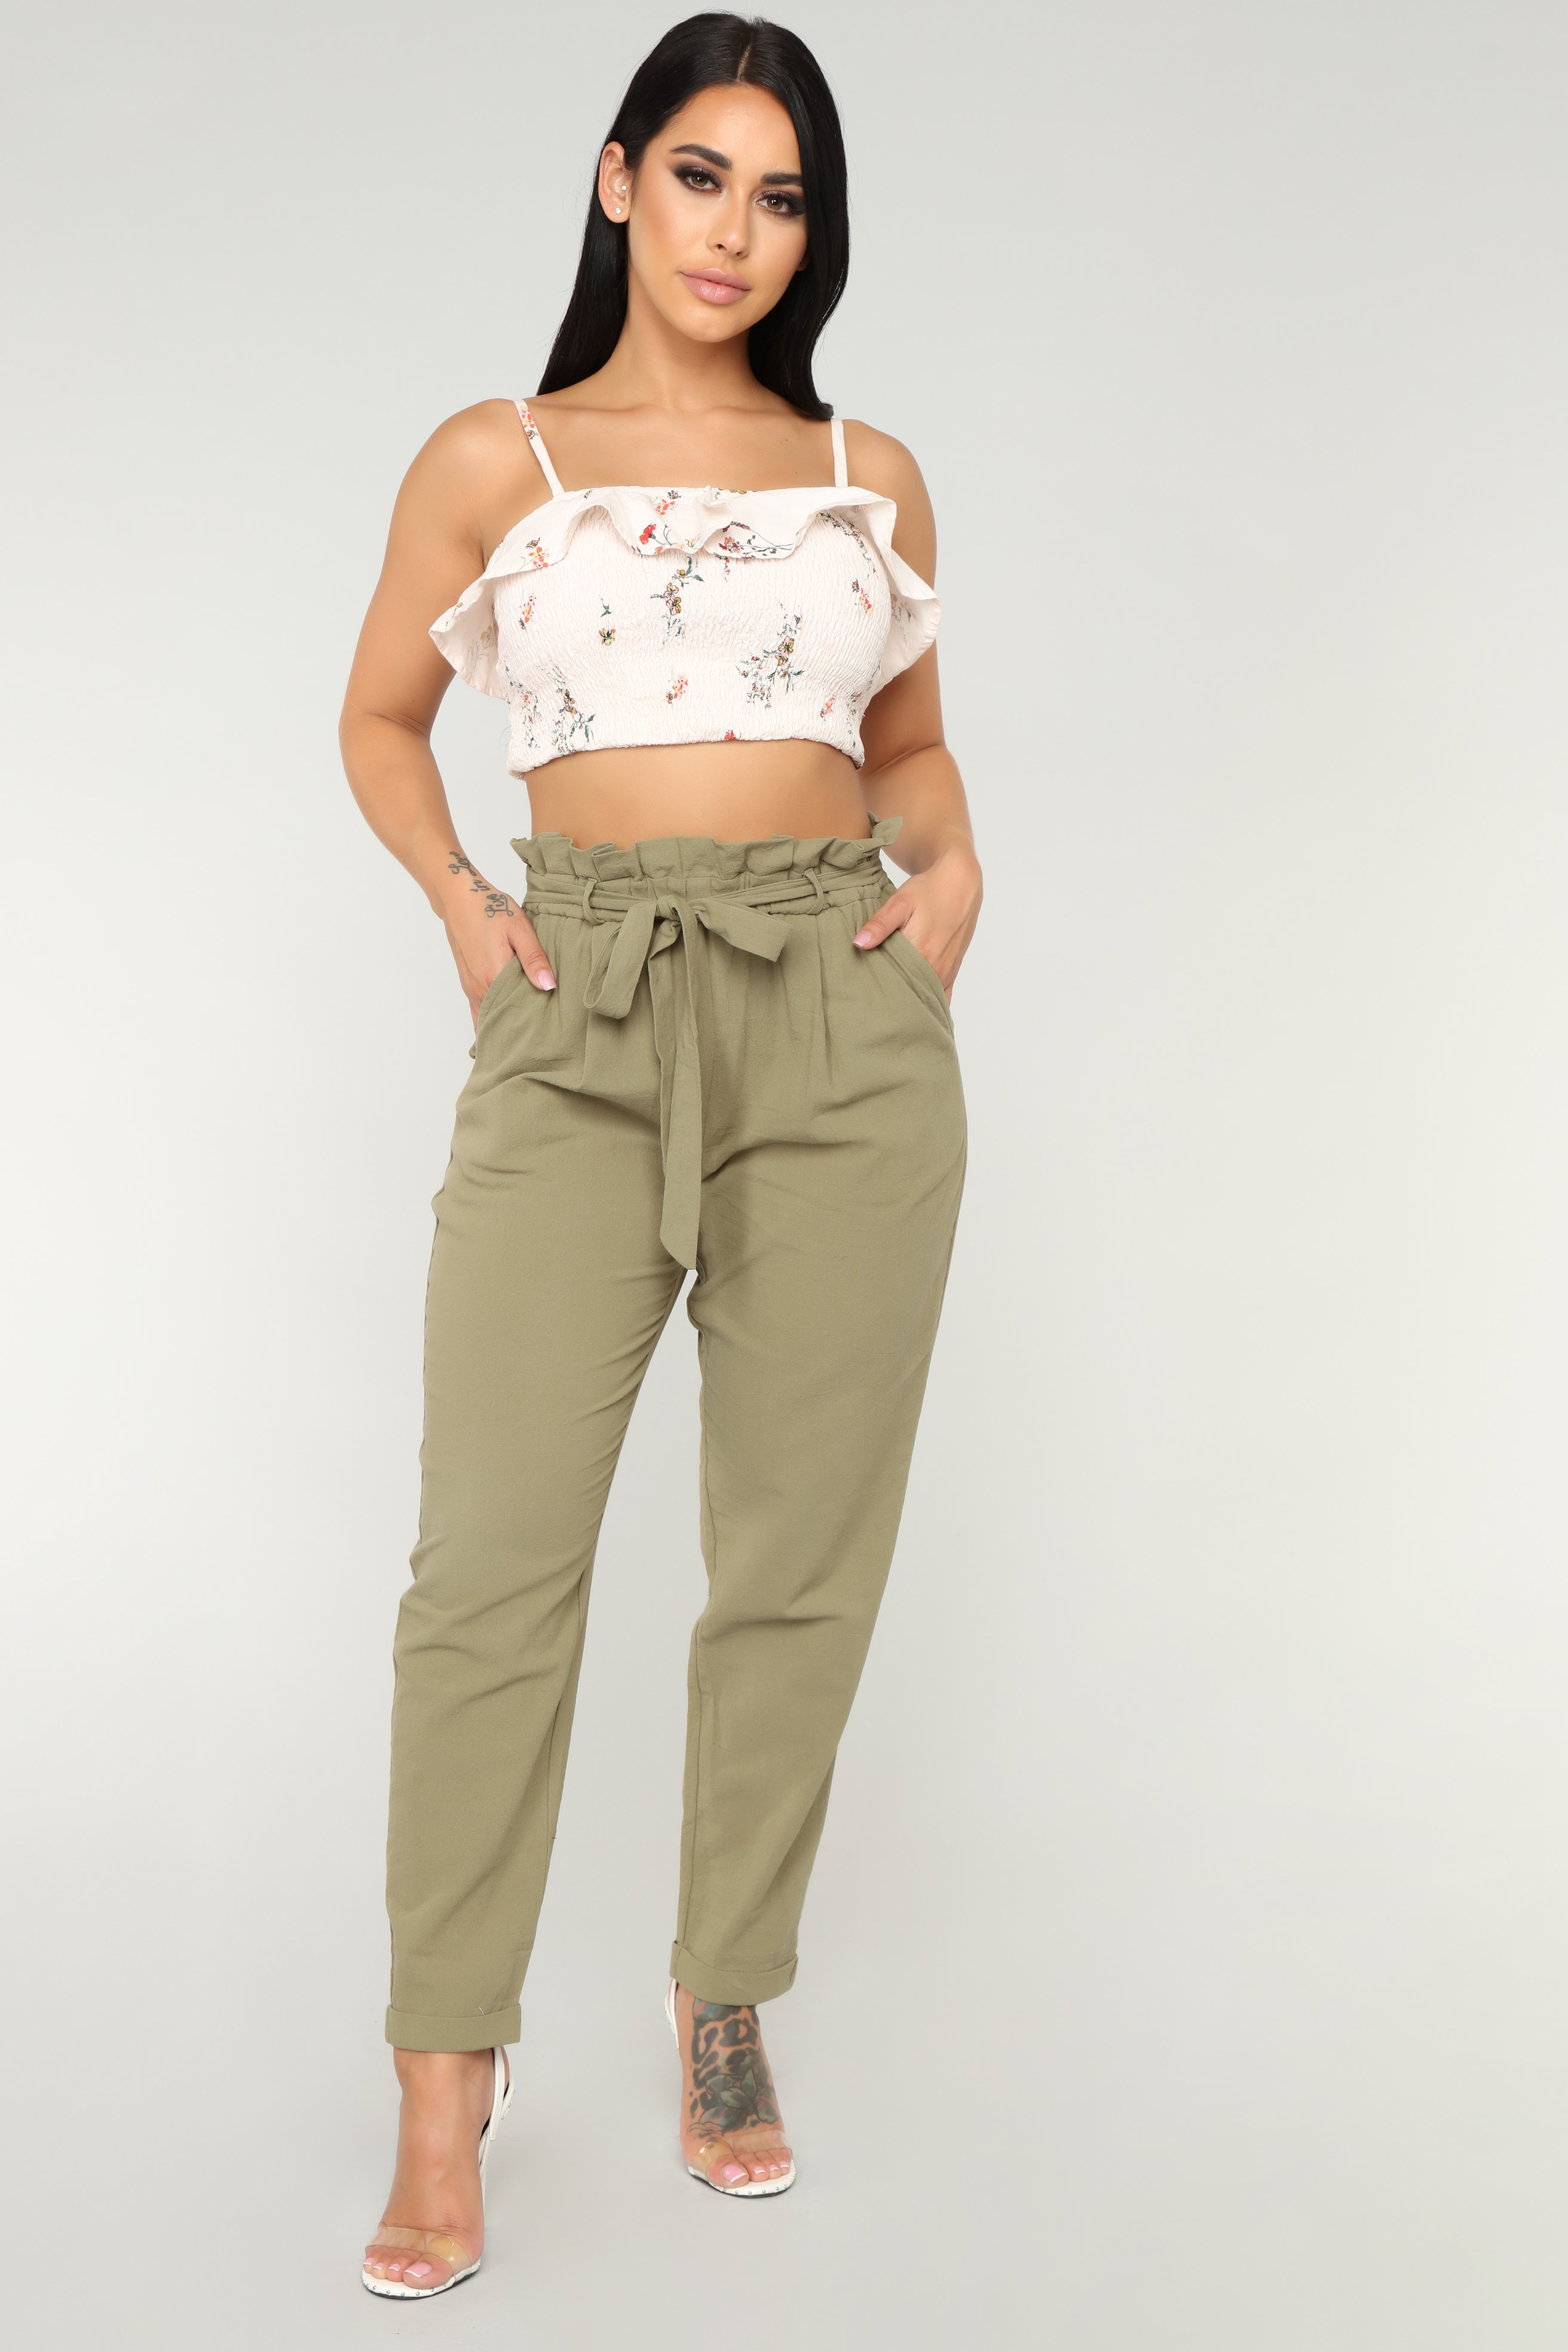 Sabrina Tie Waist Pants - Olive